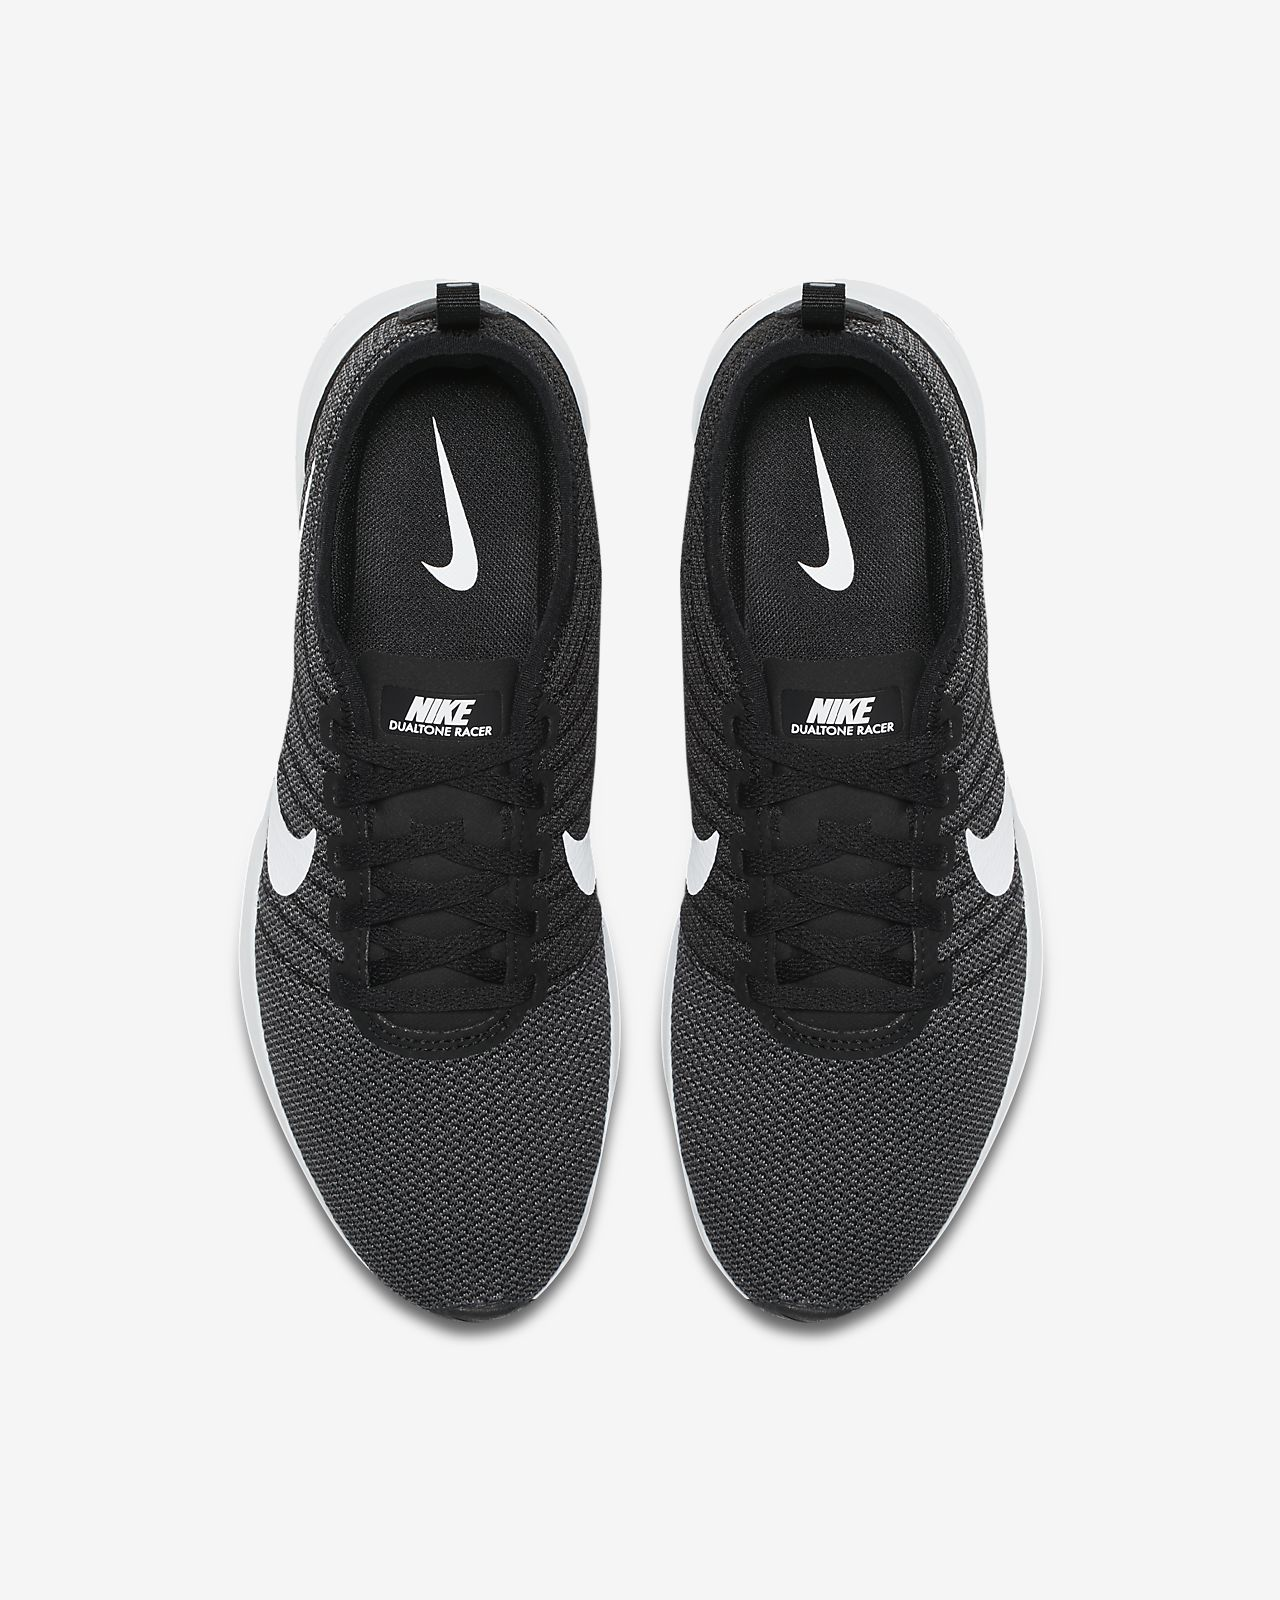 Racer Nike Women's Dualtone Nike Dualtone Shoe vmN80wOn